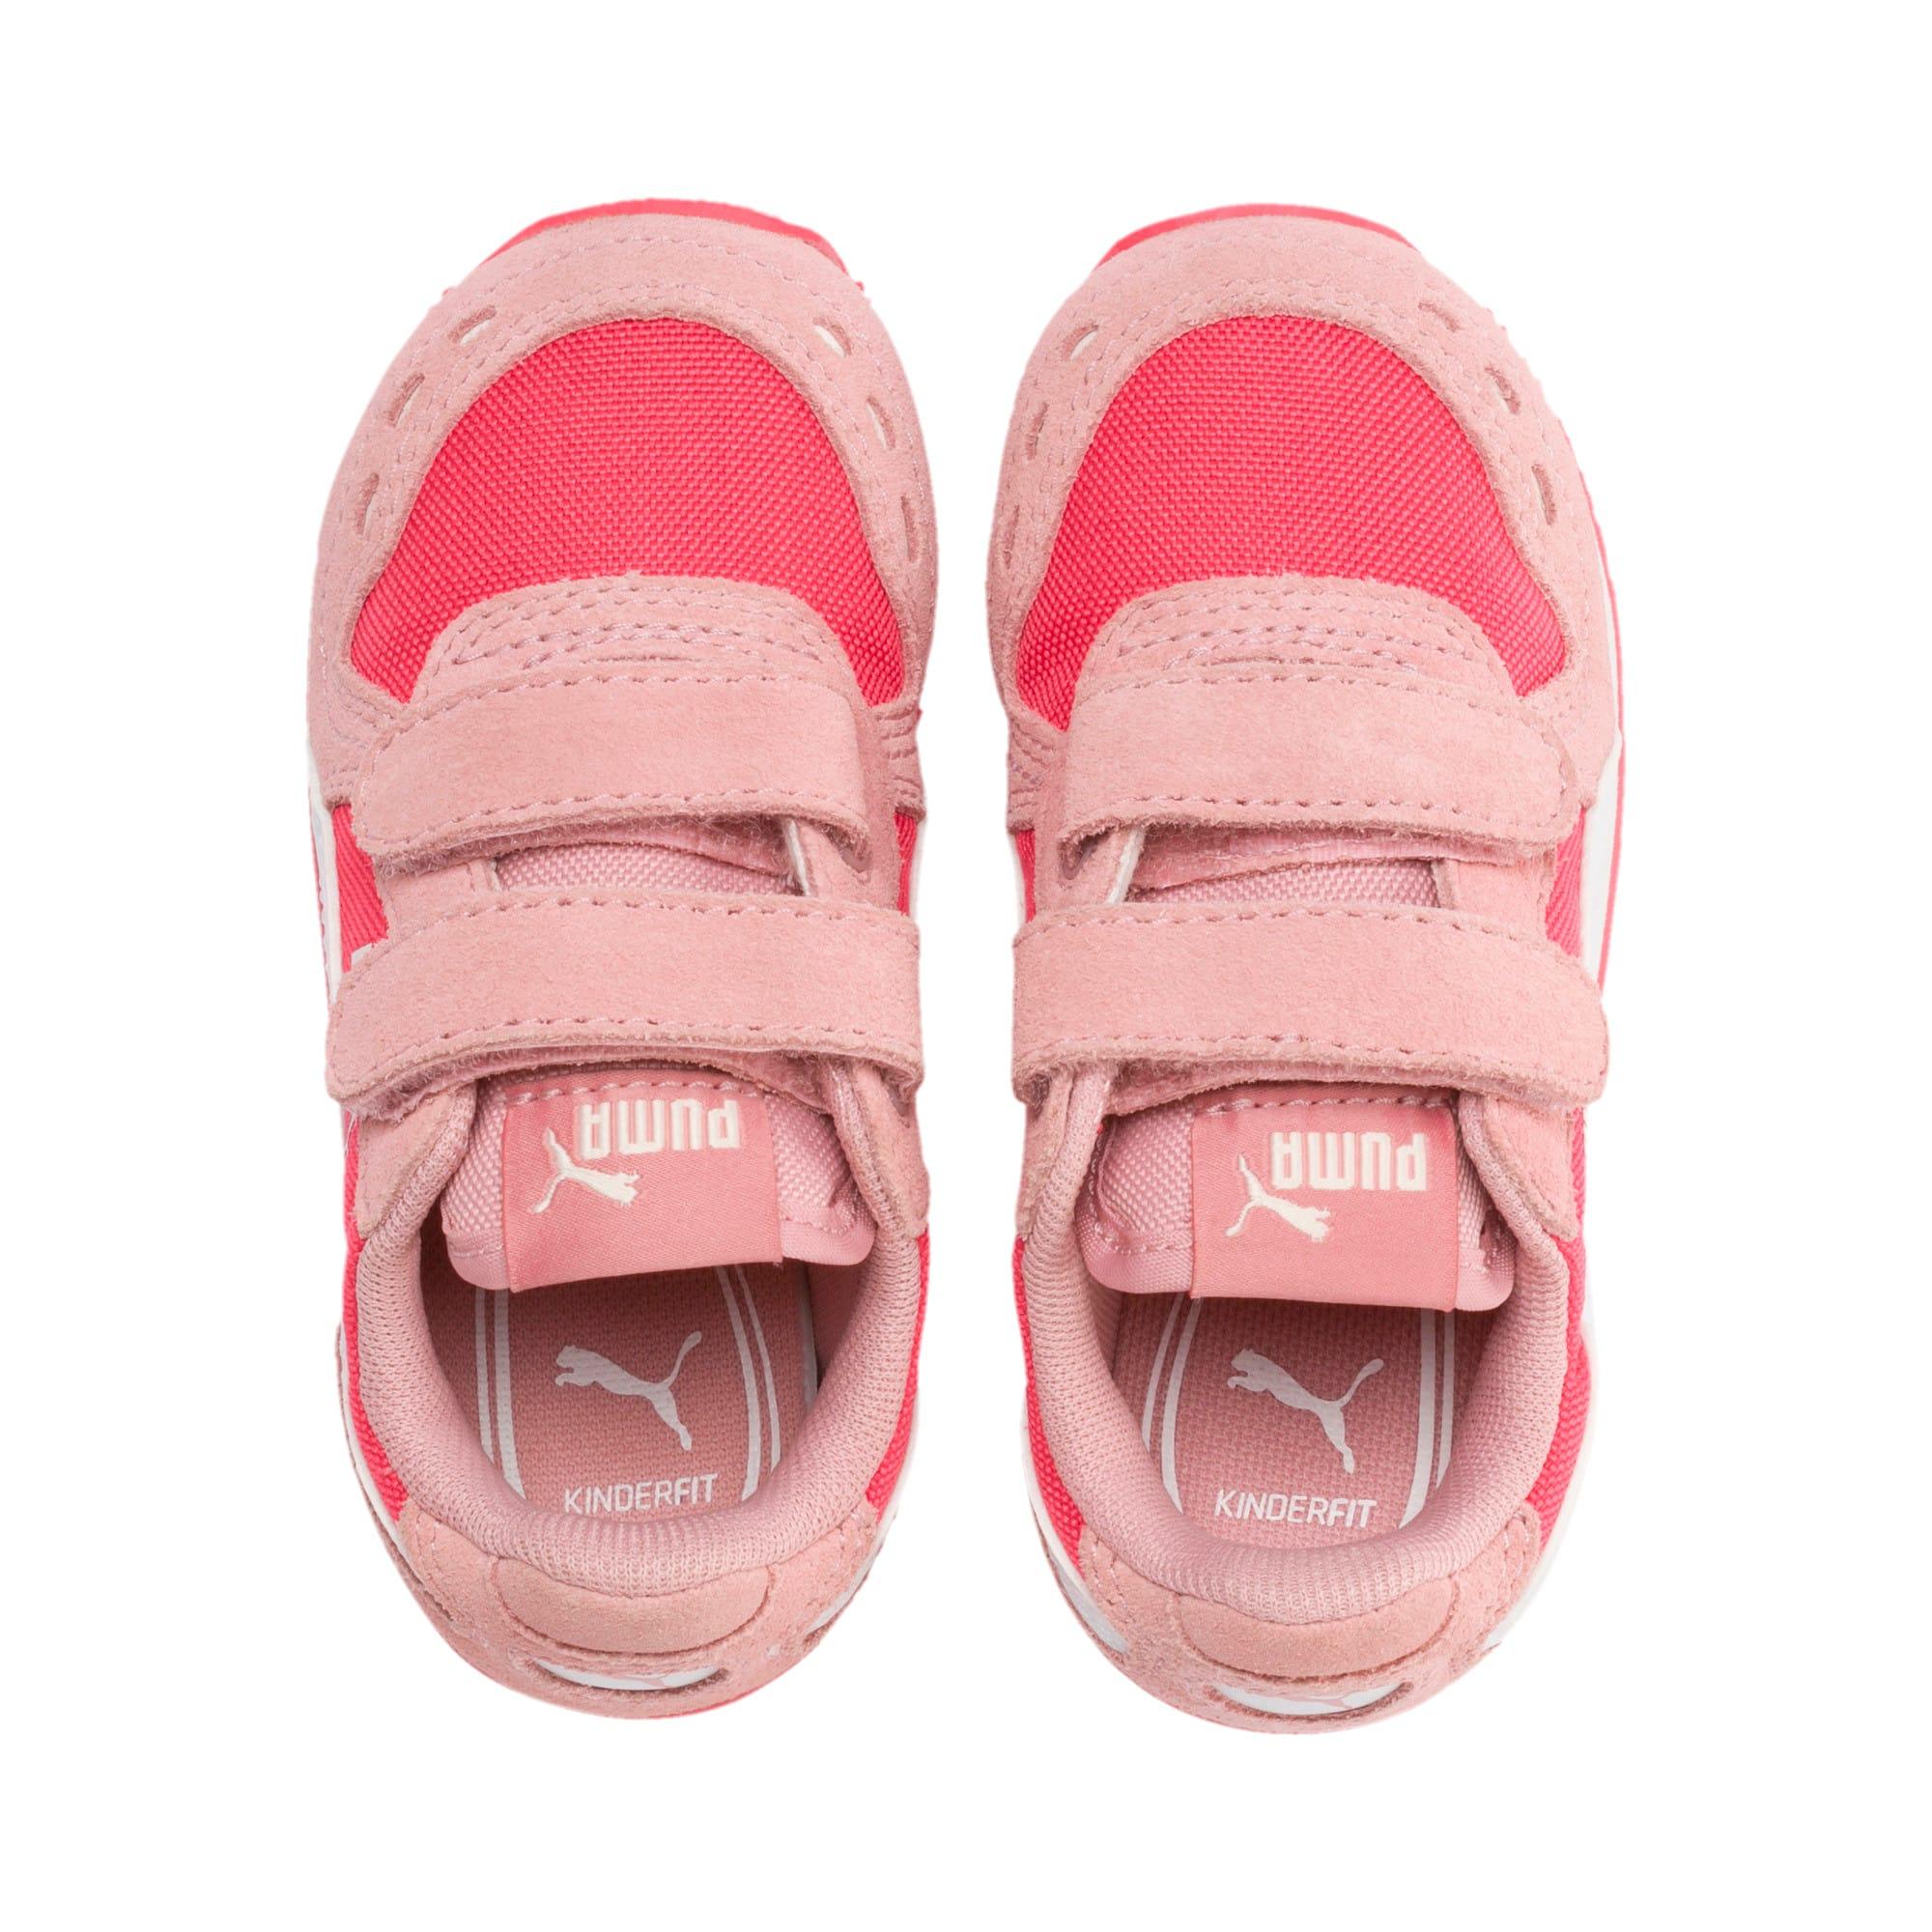 Thumbnail 6 of Cabana Racer Toddler Shoes, Calypso Coral-Bridal Rose, medium